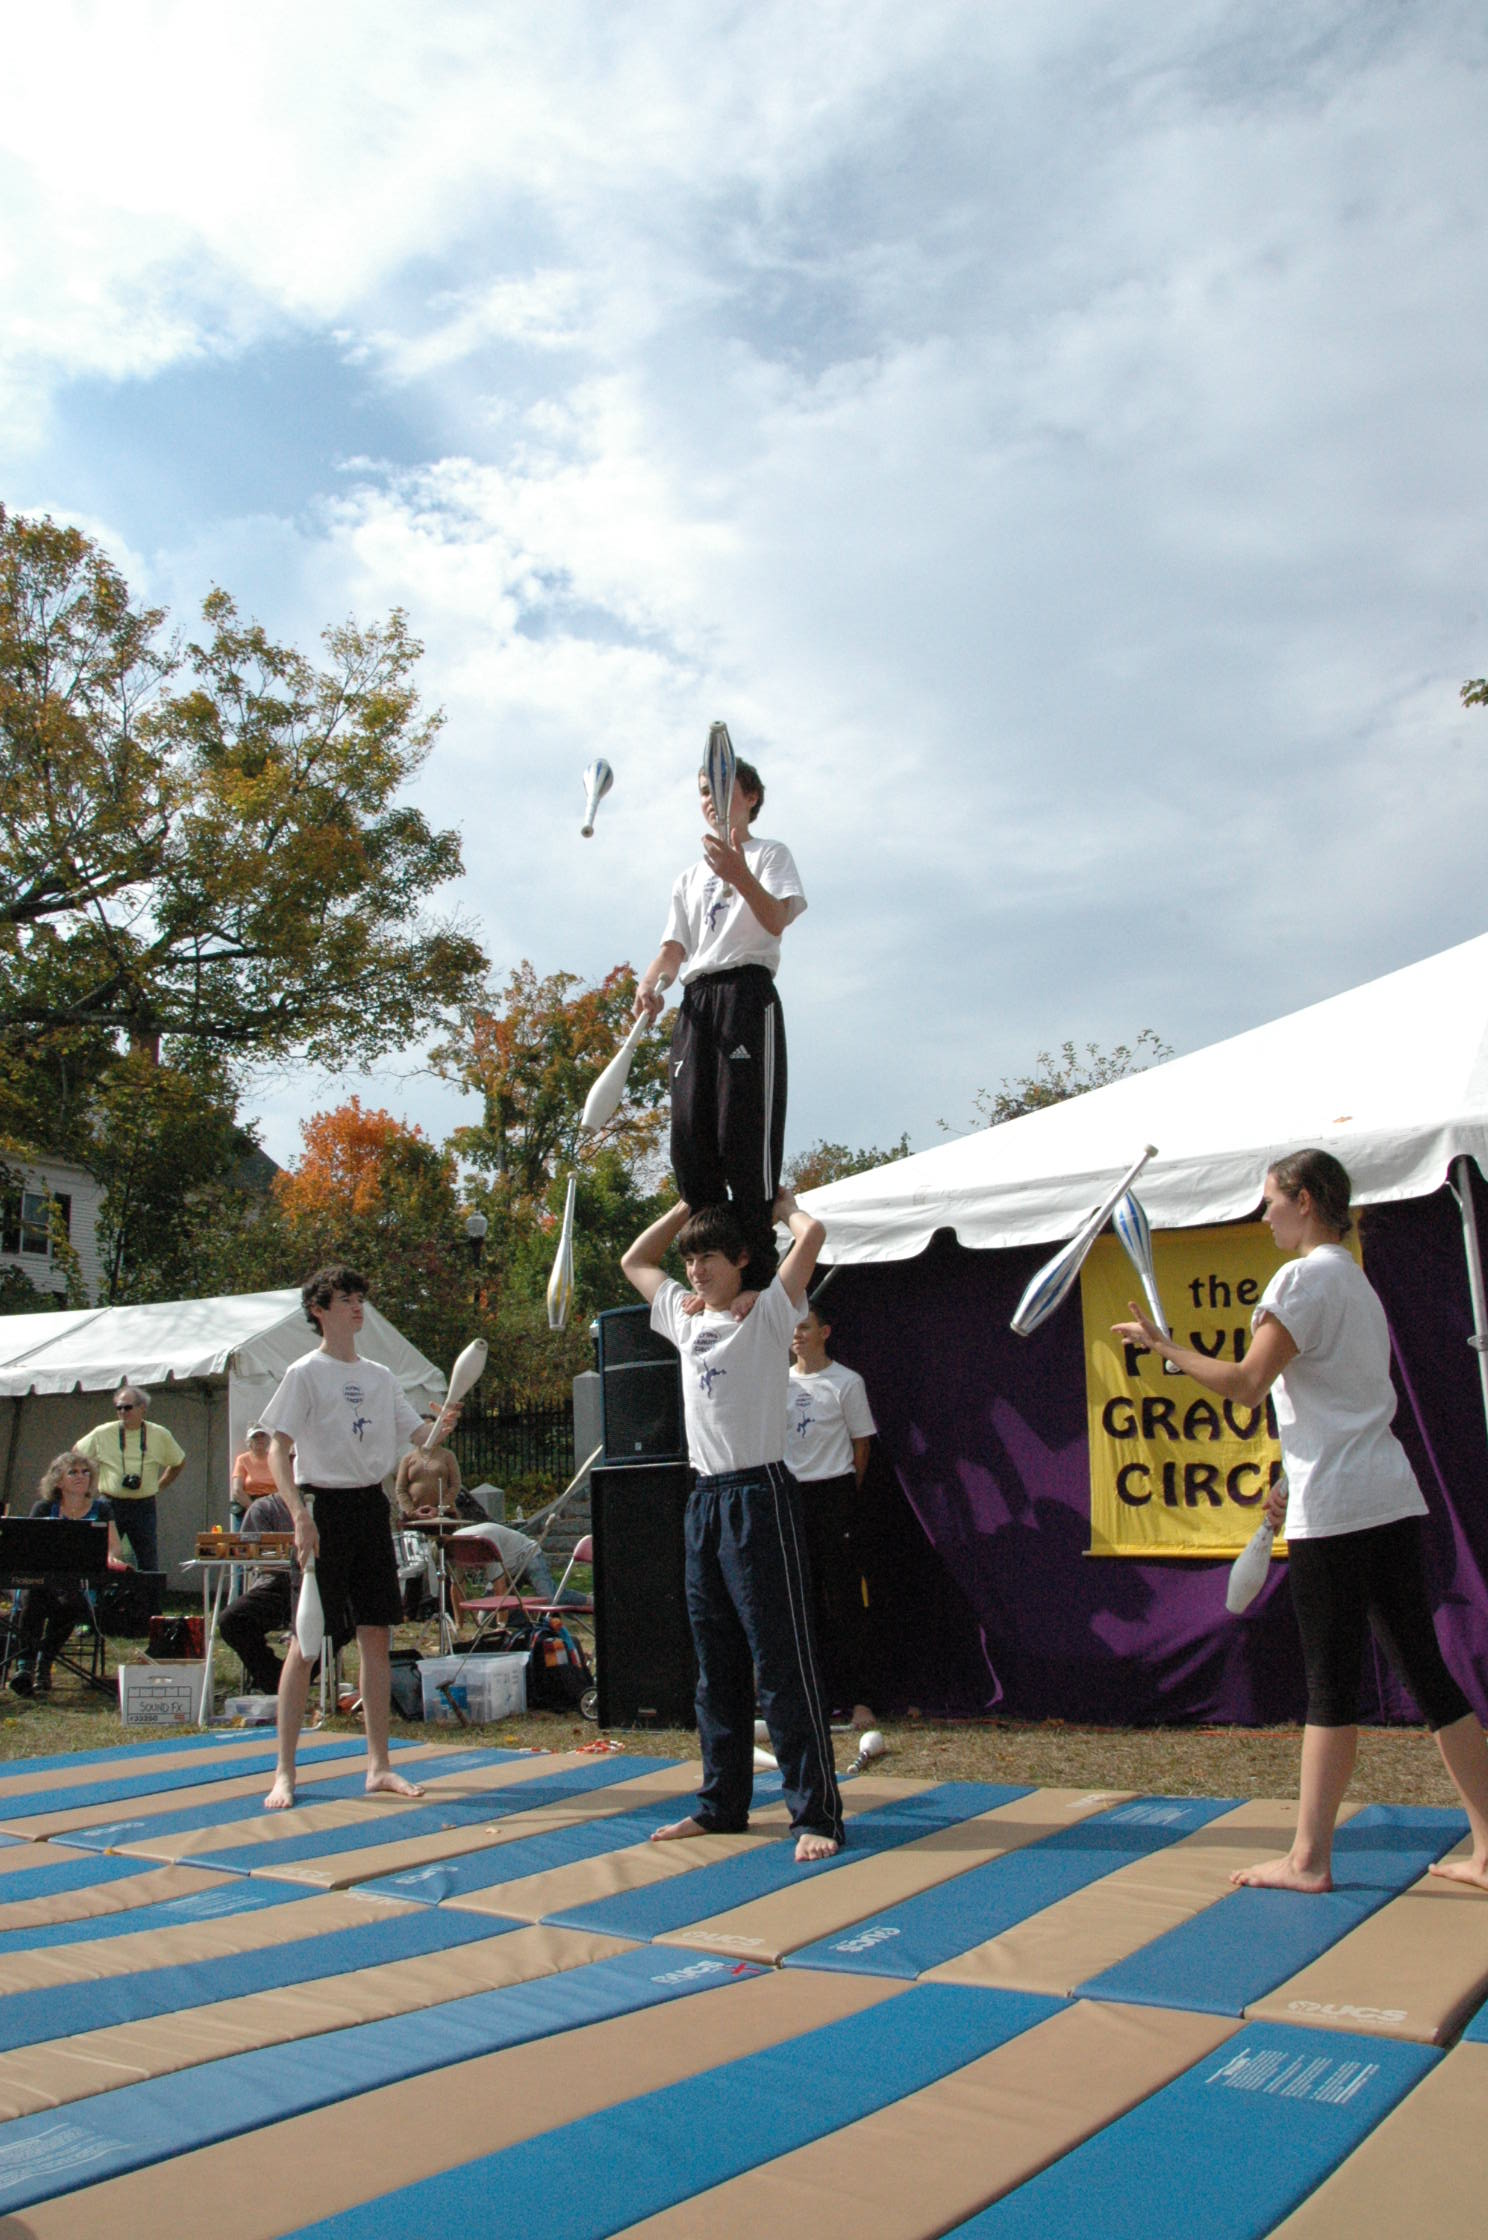 2012-10-06 Flyin Gravity Circus - Pumpkin 119.JPG